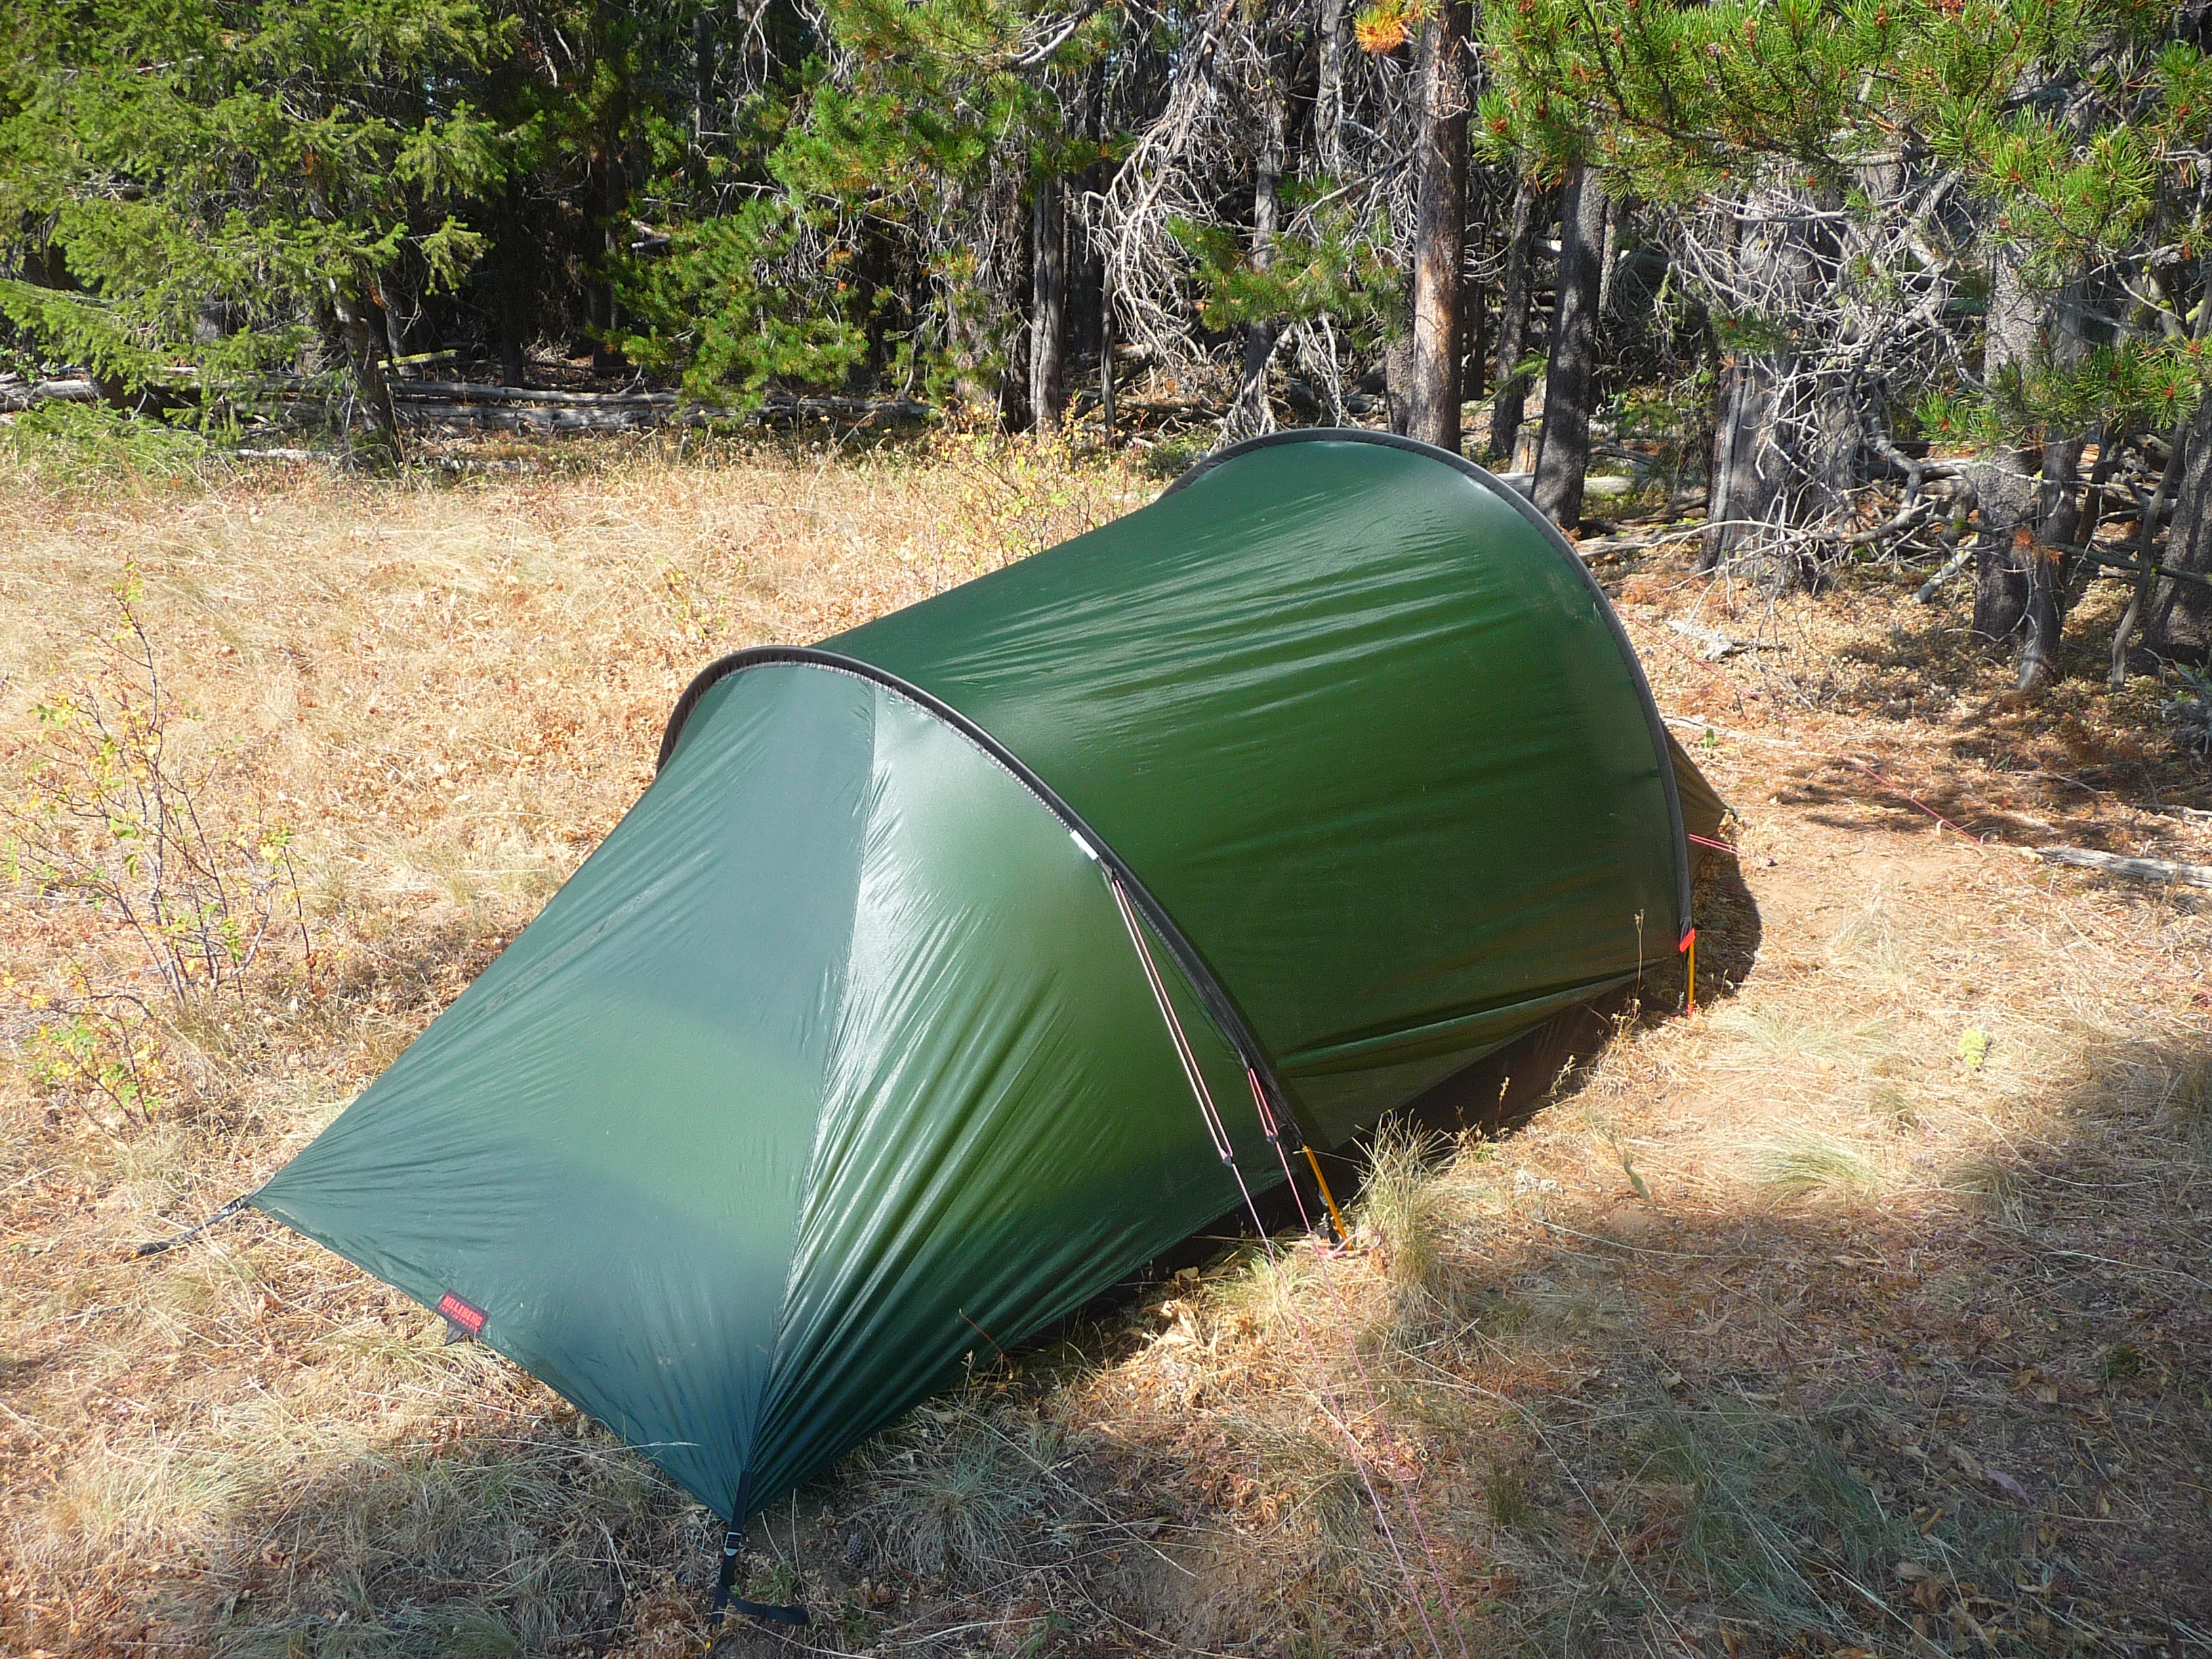 Hilleberg Anjan 3 Tent Review